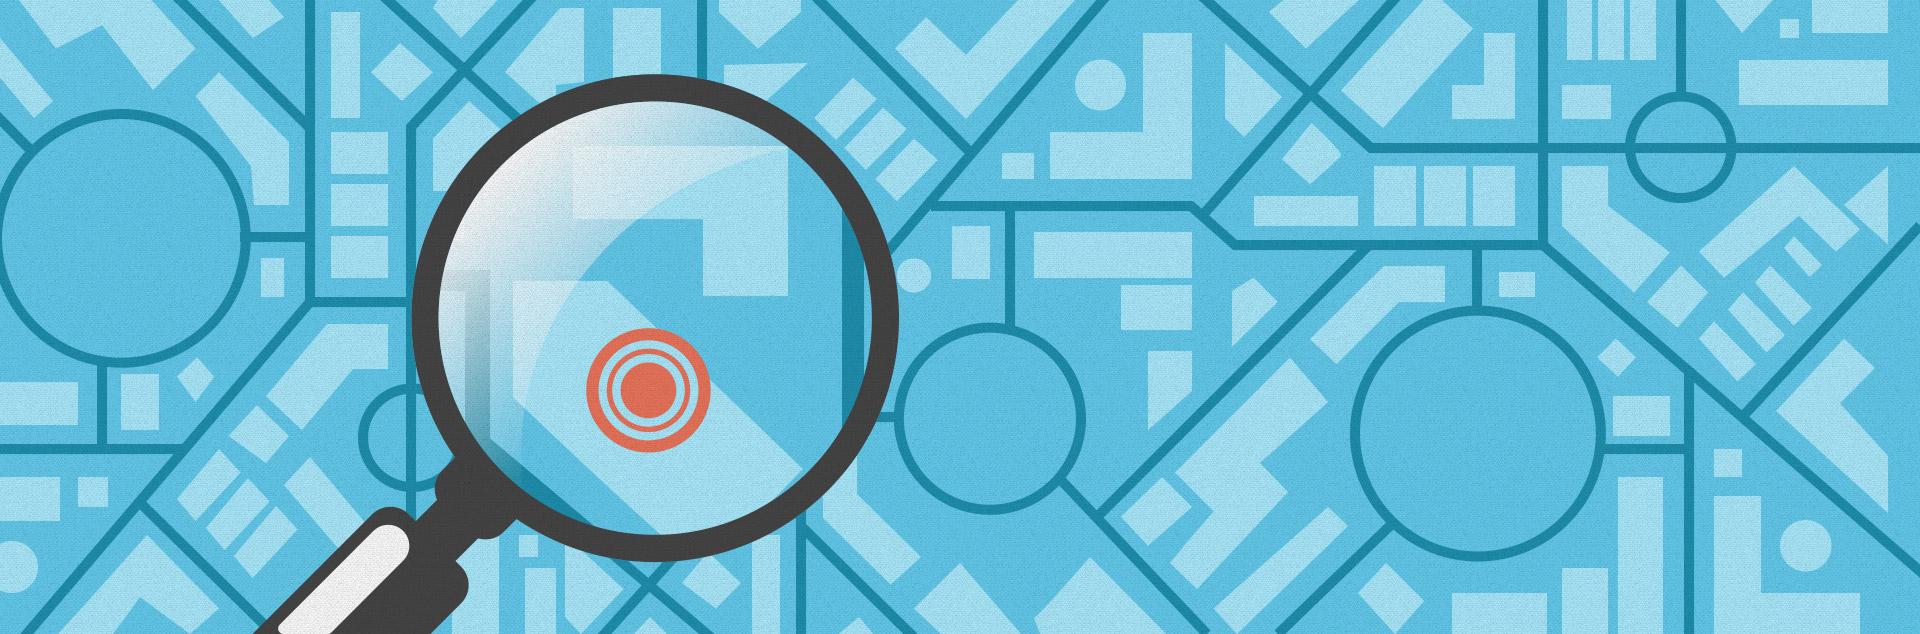 micro-location-targeting